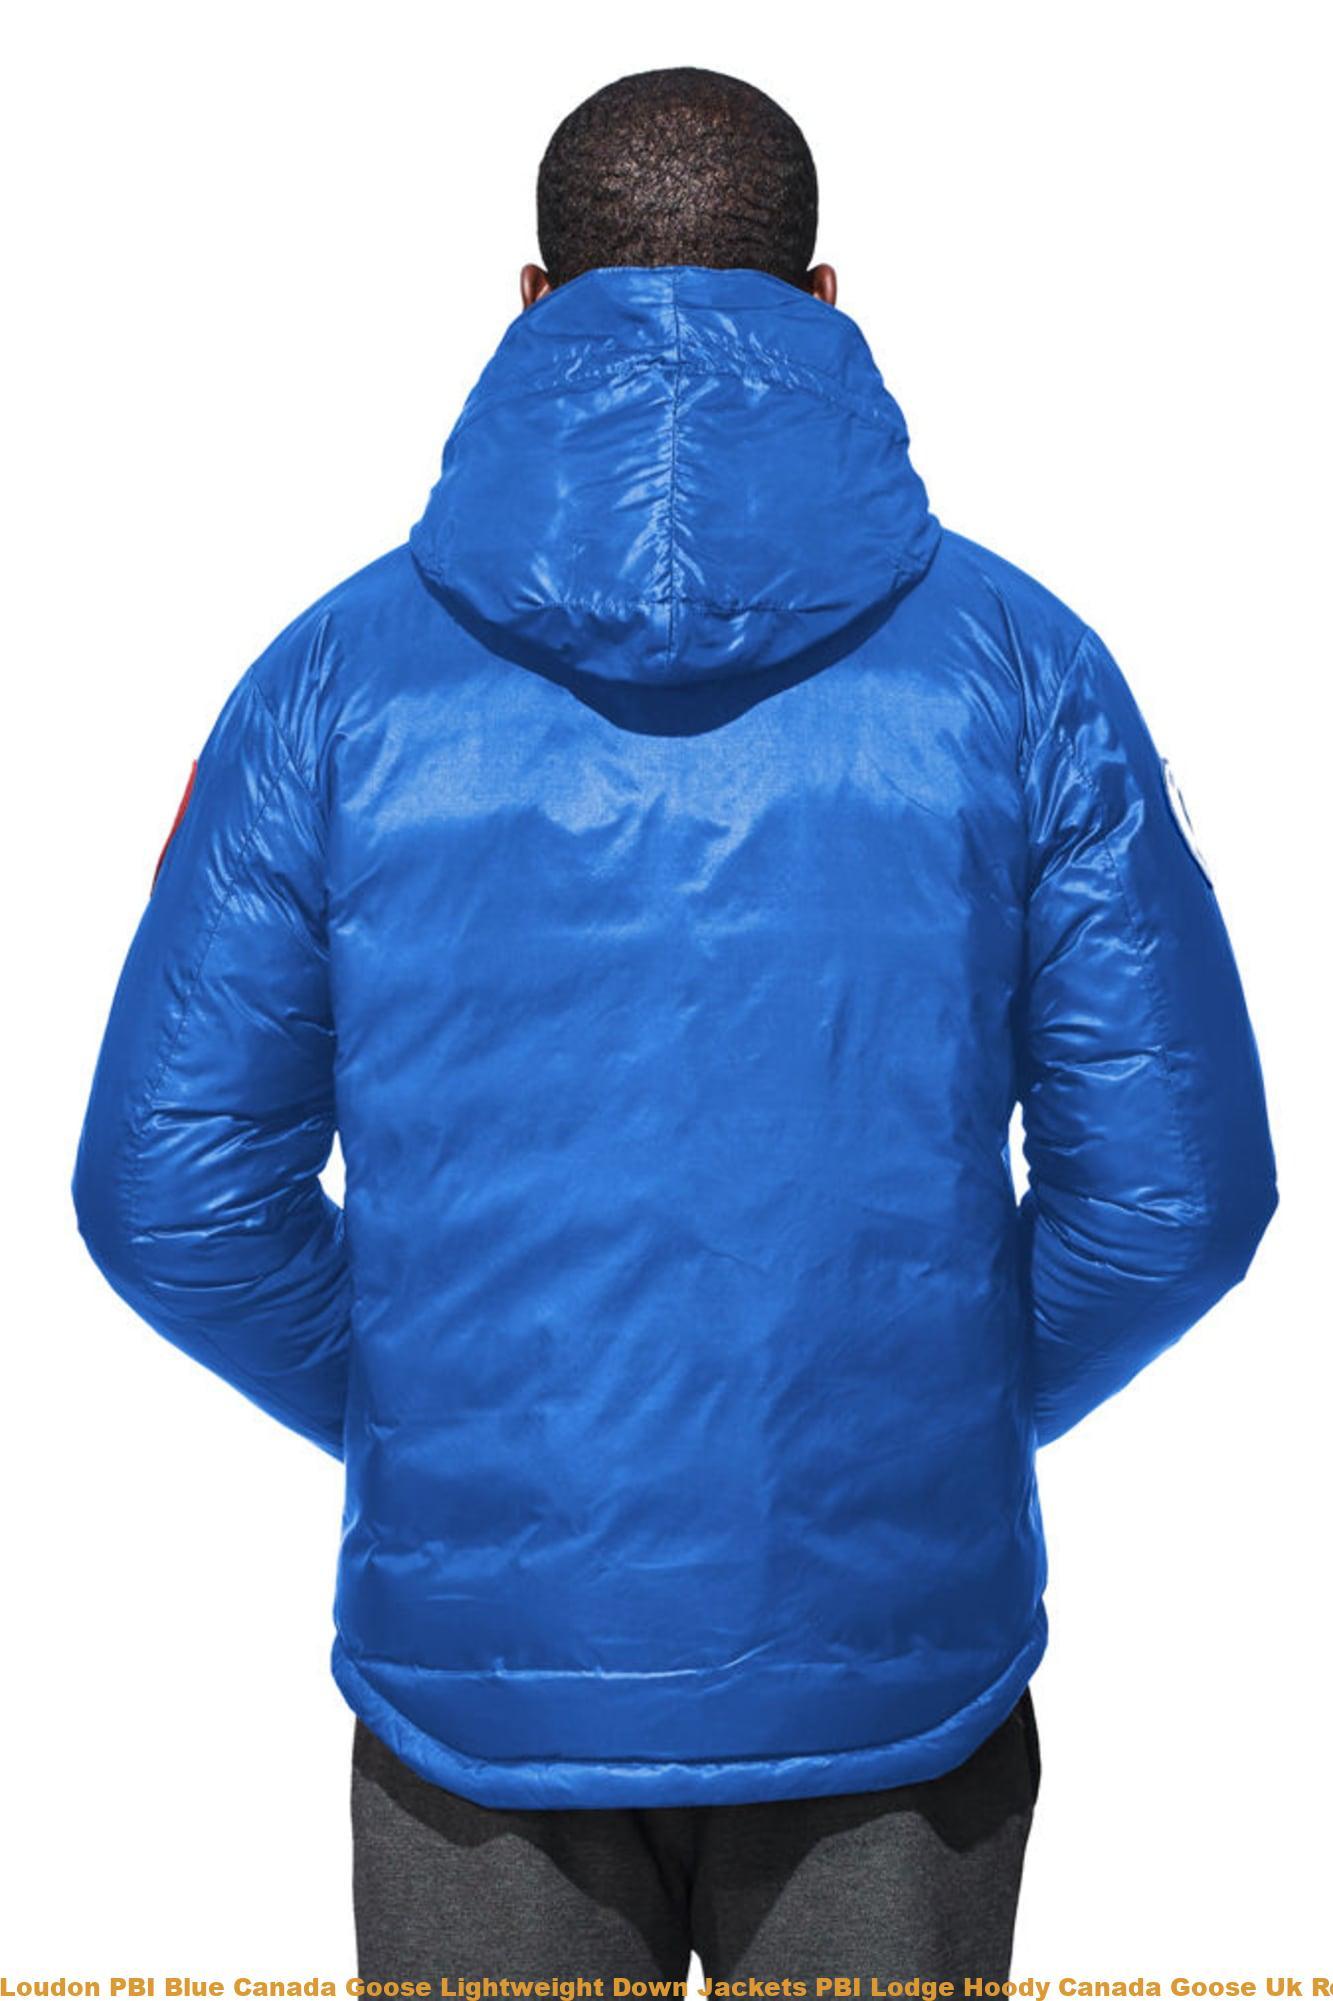 loudon pbi blue canada goose lightweight down jackets pbi. Black Bedroom Furniture Sets. Home Design Ideas